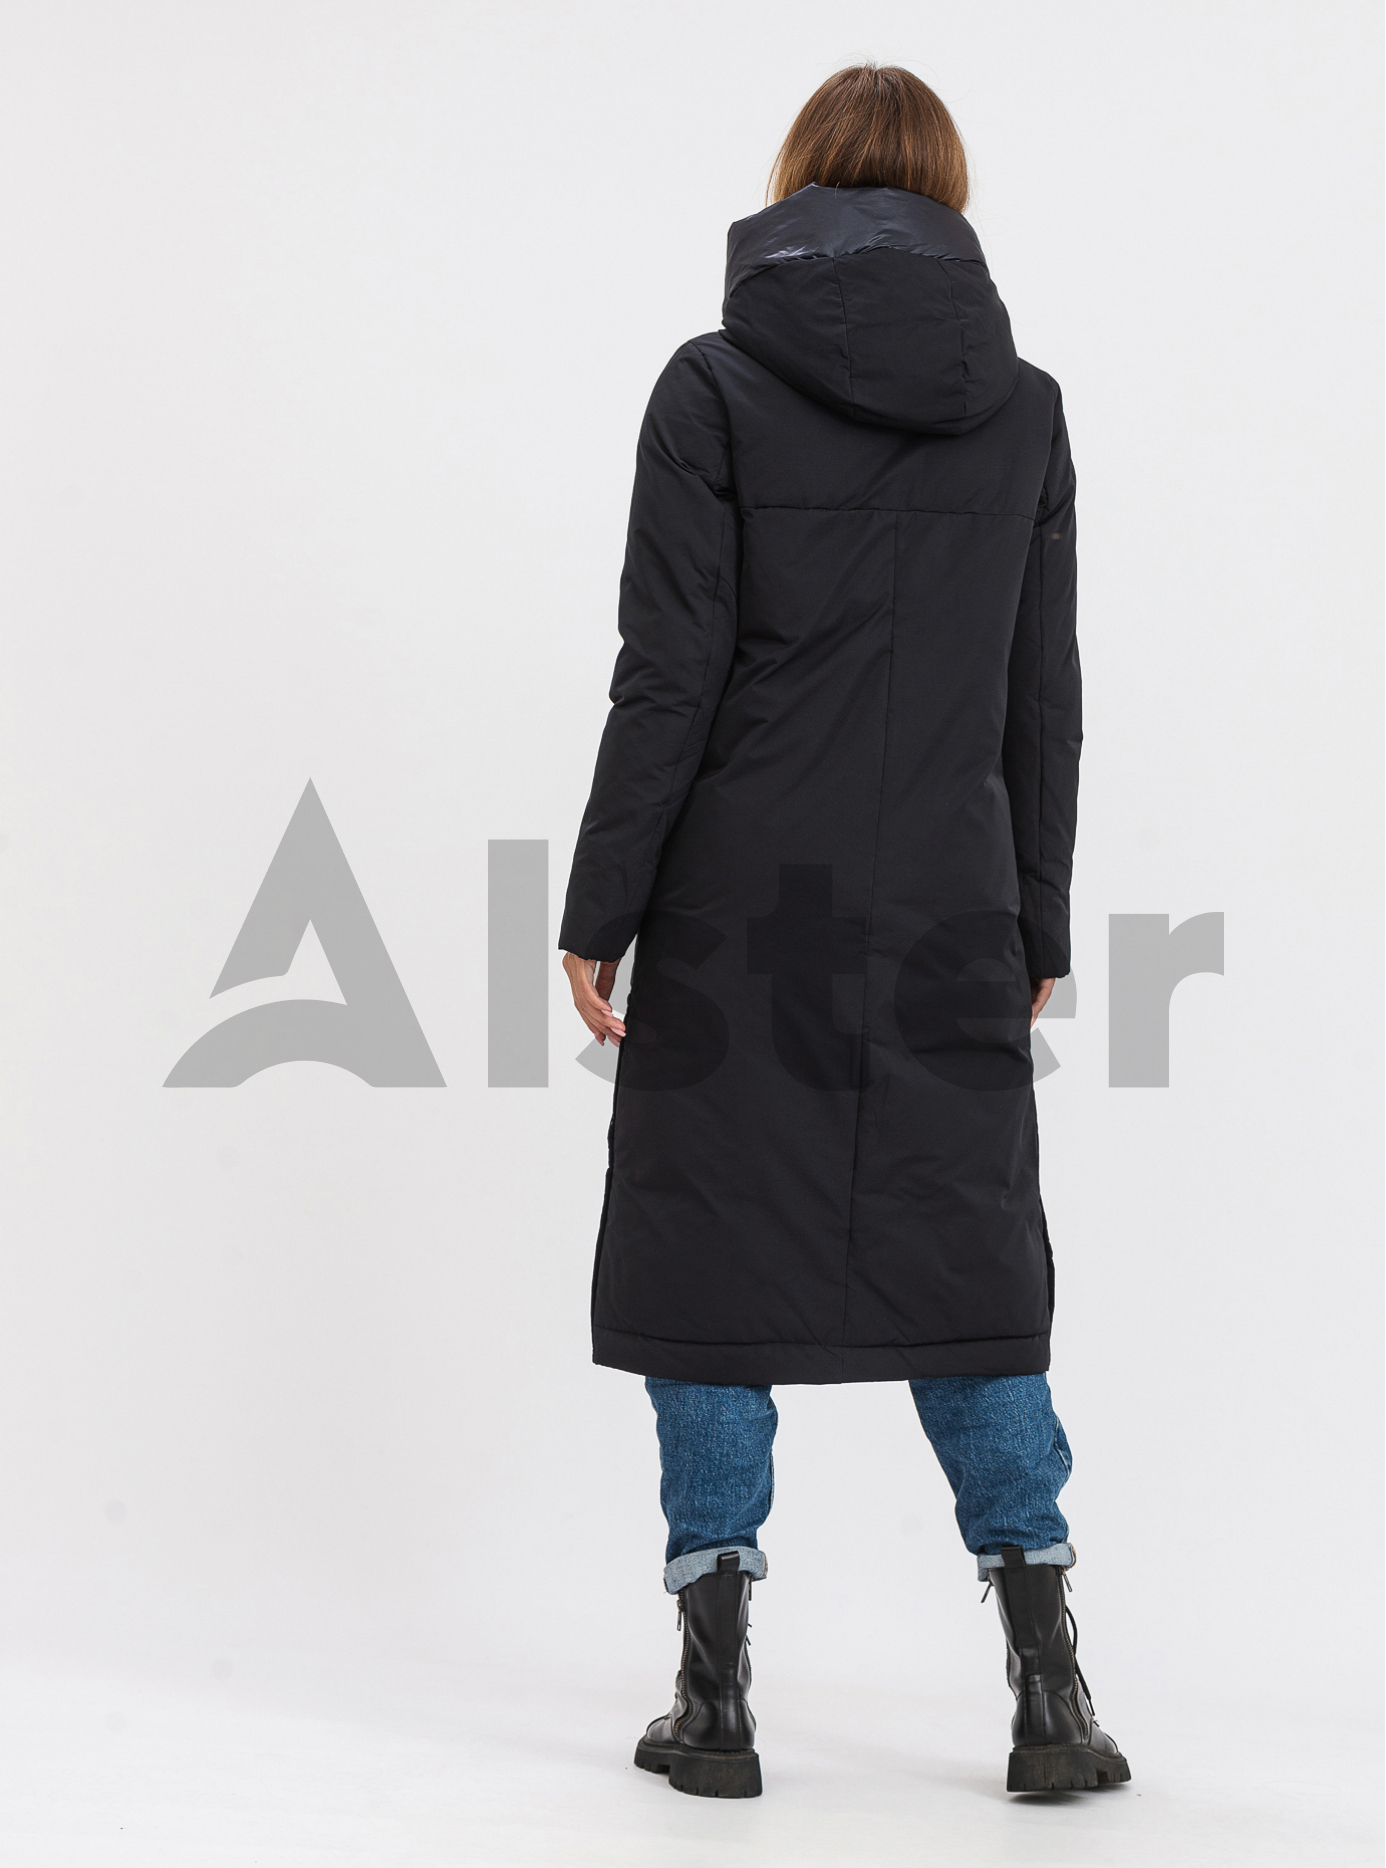 Жіноча довга куртка FineBabyCat Тёмно-синий M (21-565-07): фото - Alster.ua